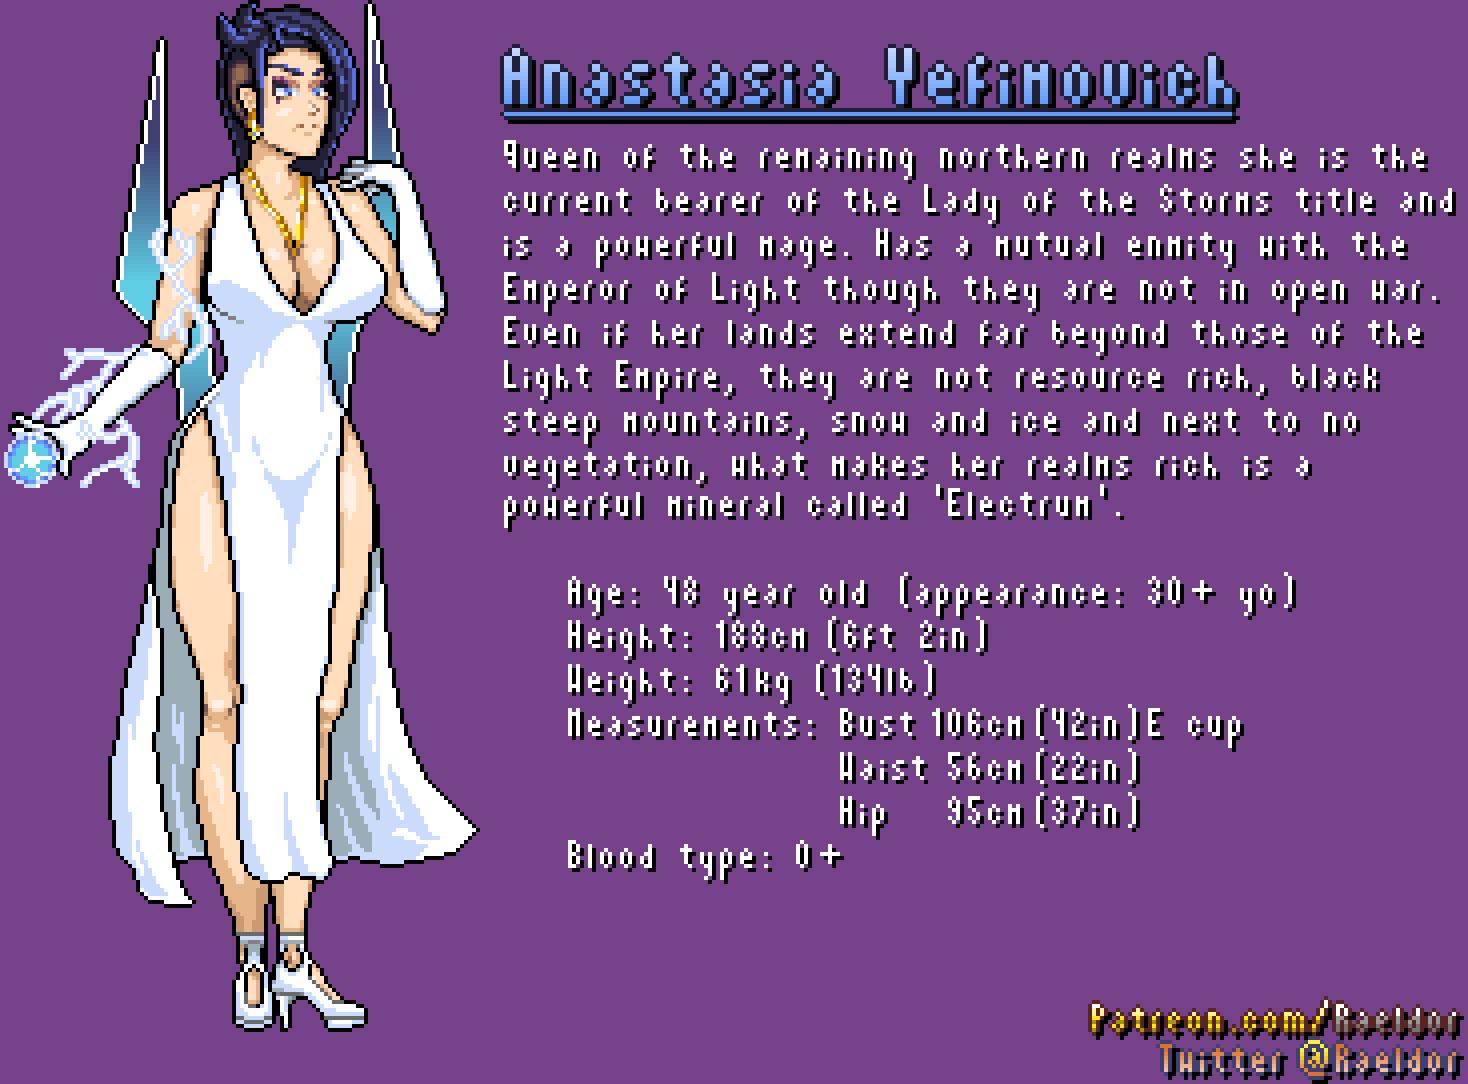 Character Sheet: Anastasia